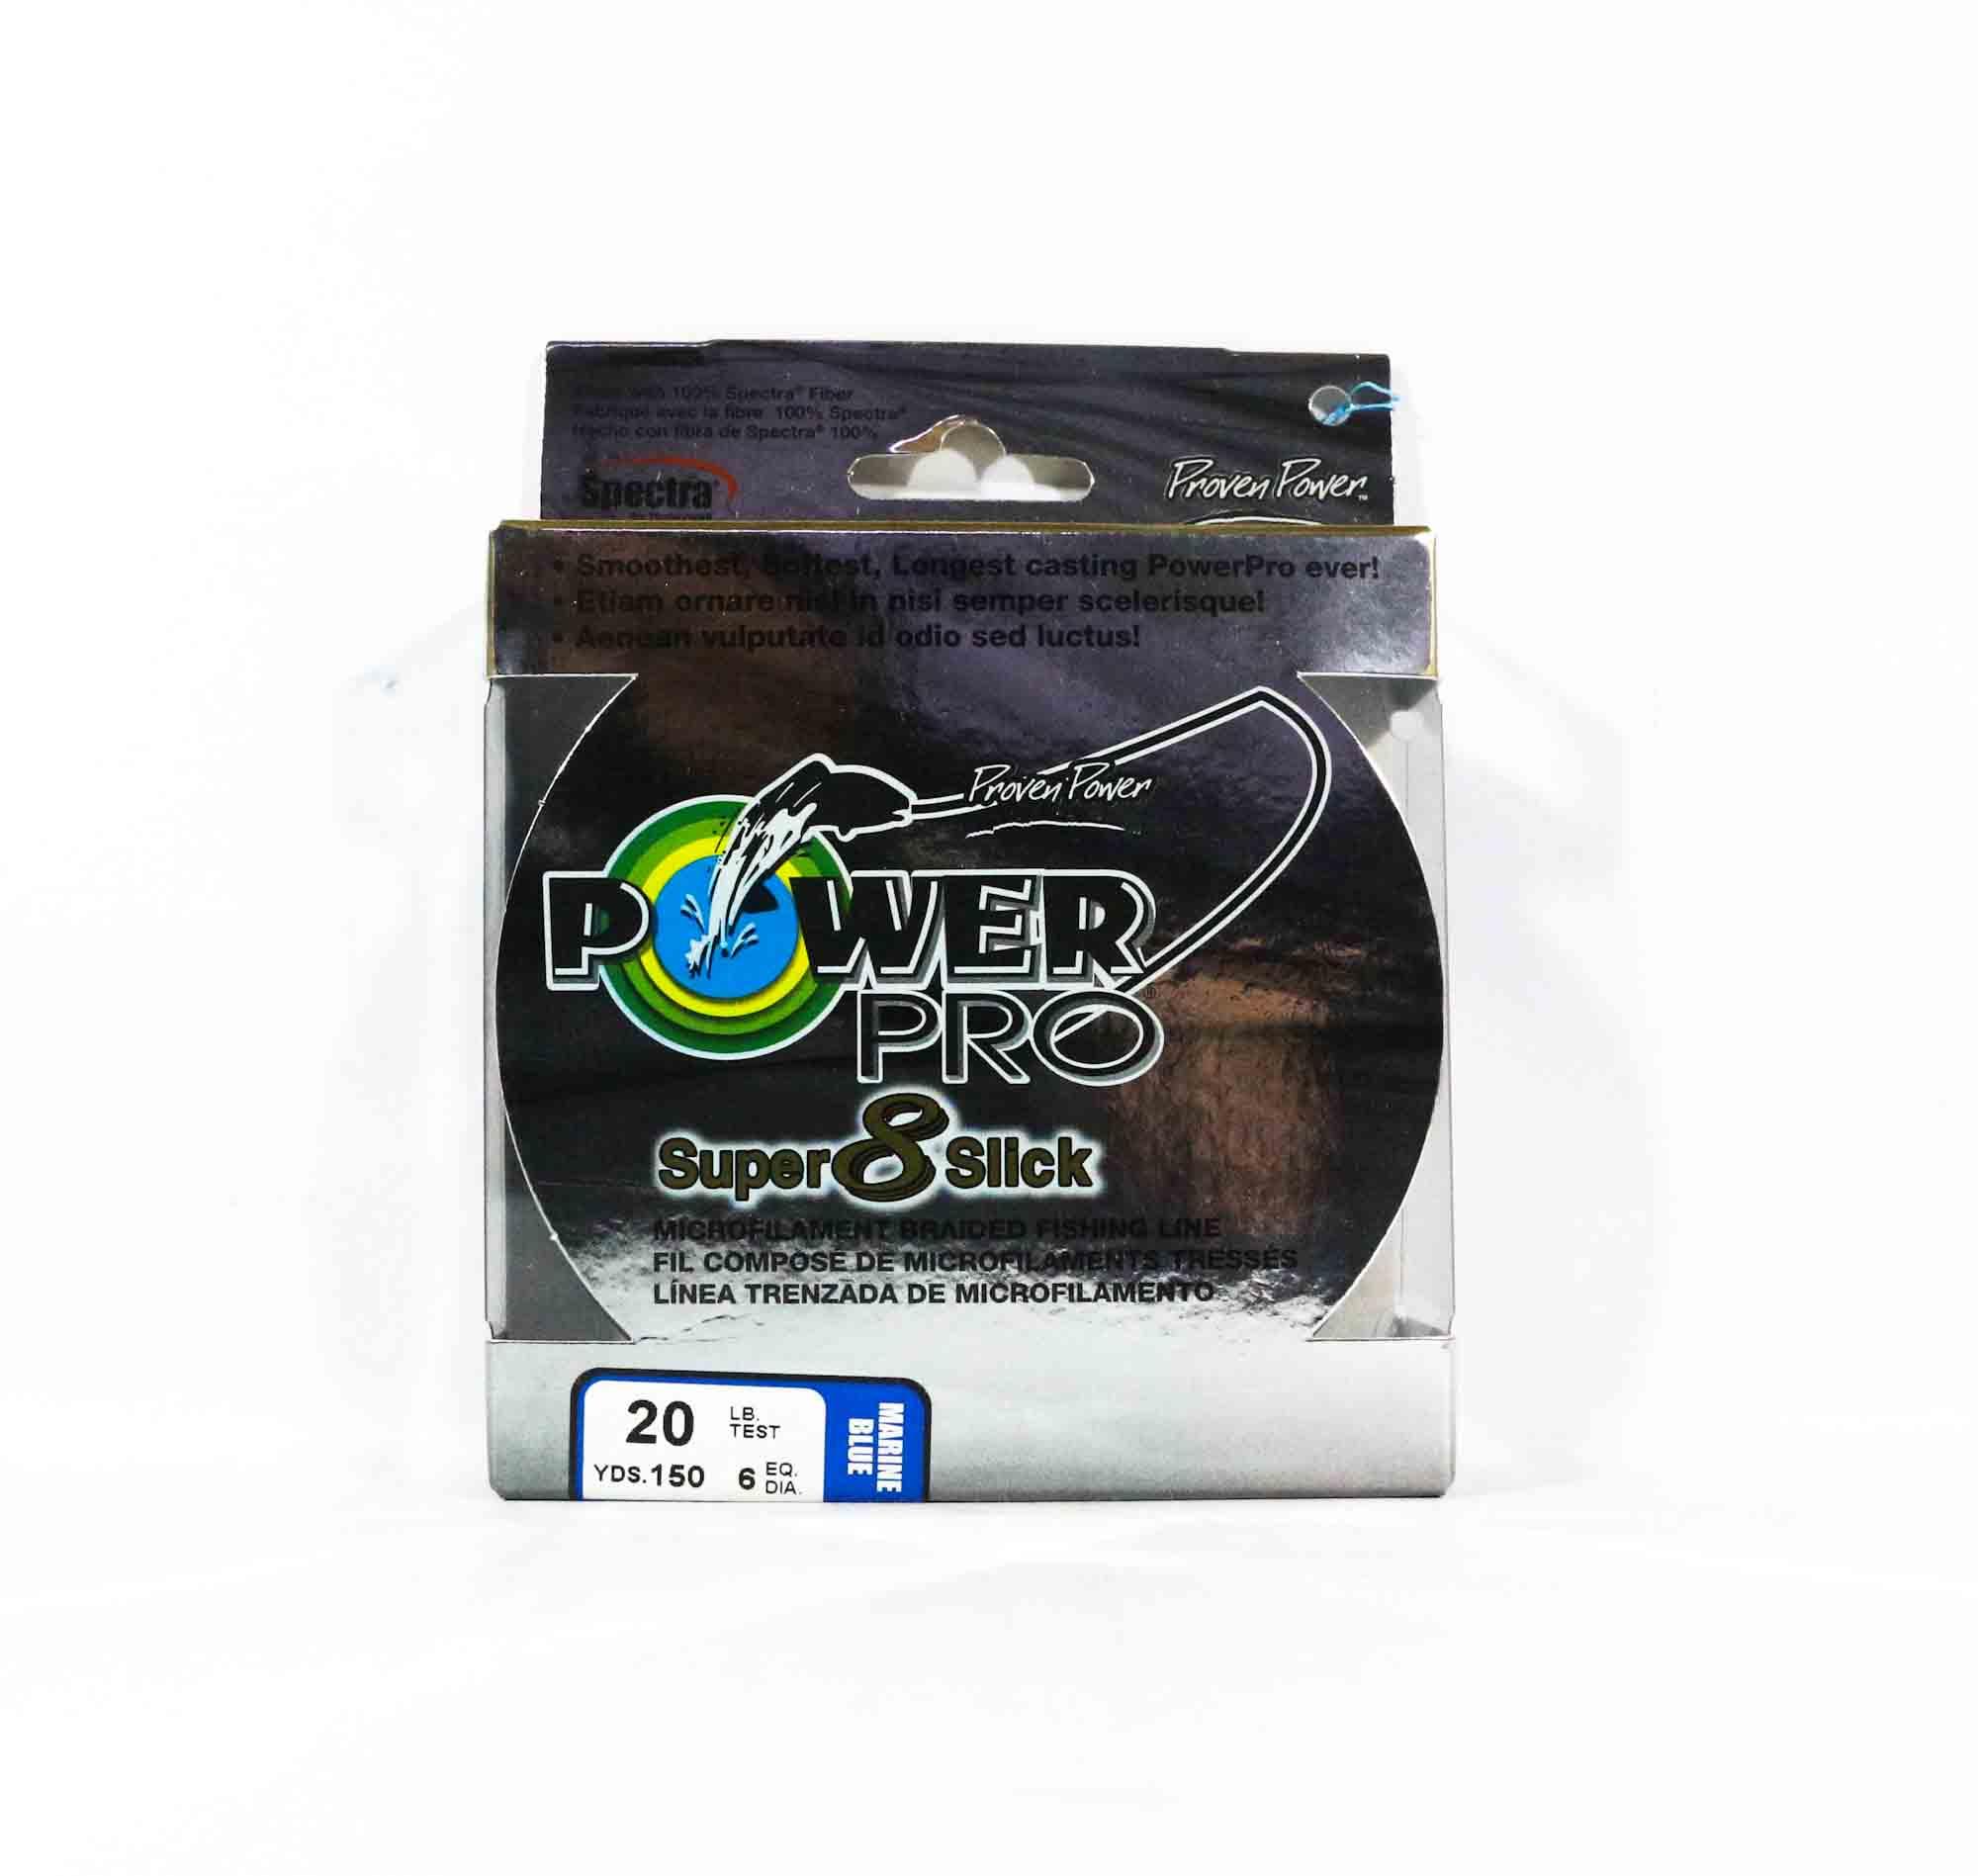 Power Pro Super 8 Slick Spectra Line 20lb by 150yds Blue (0152)